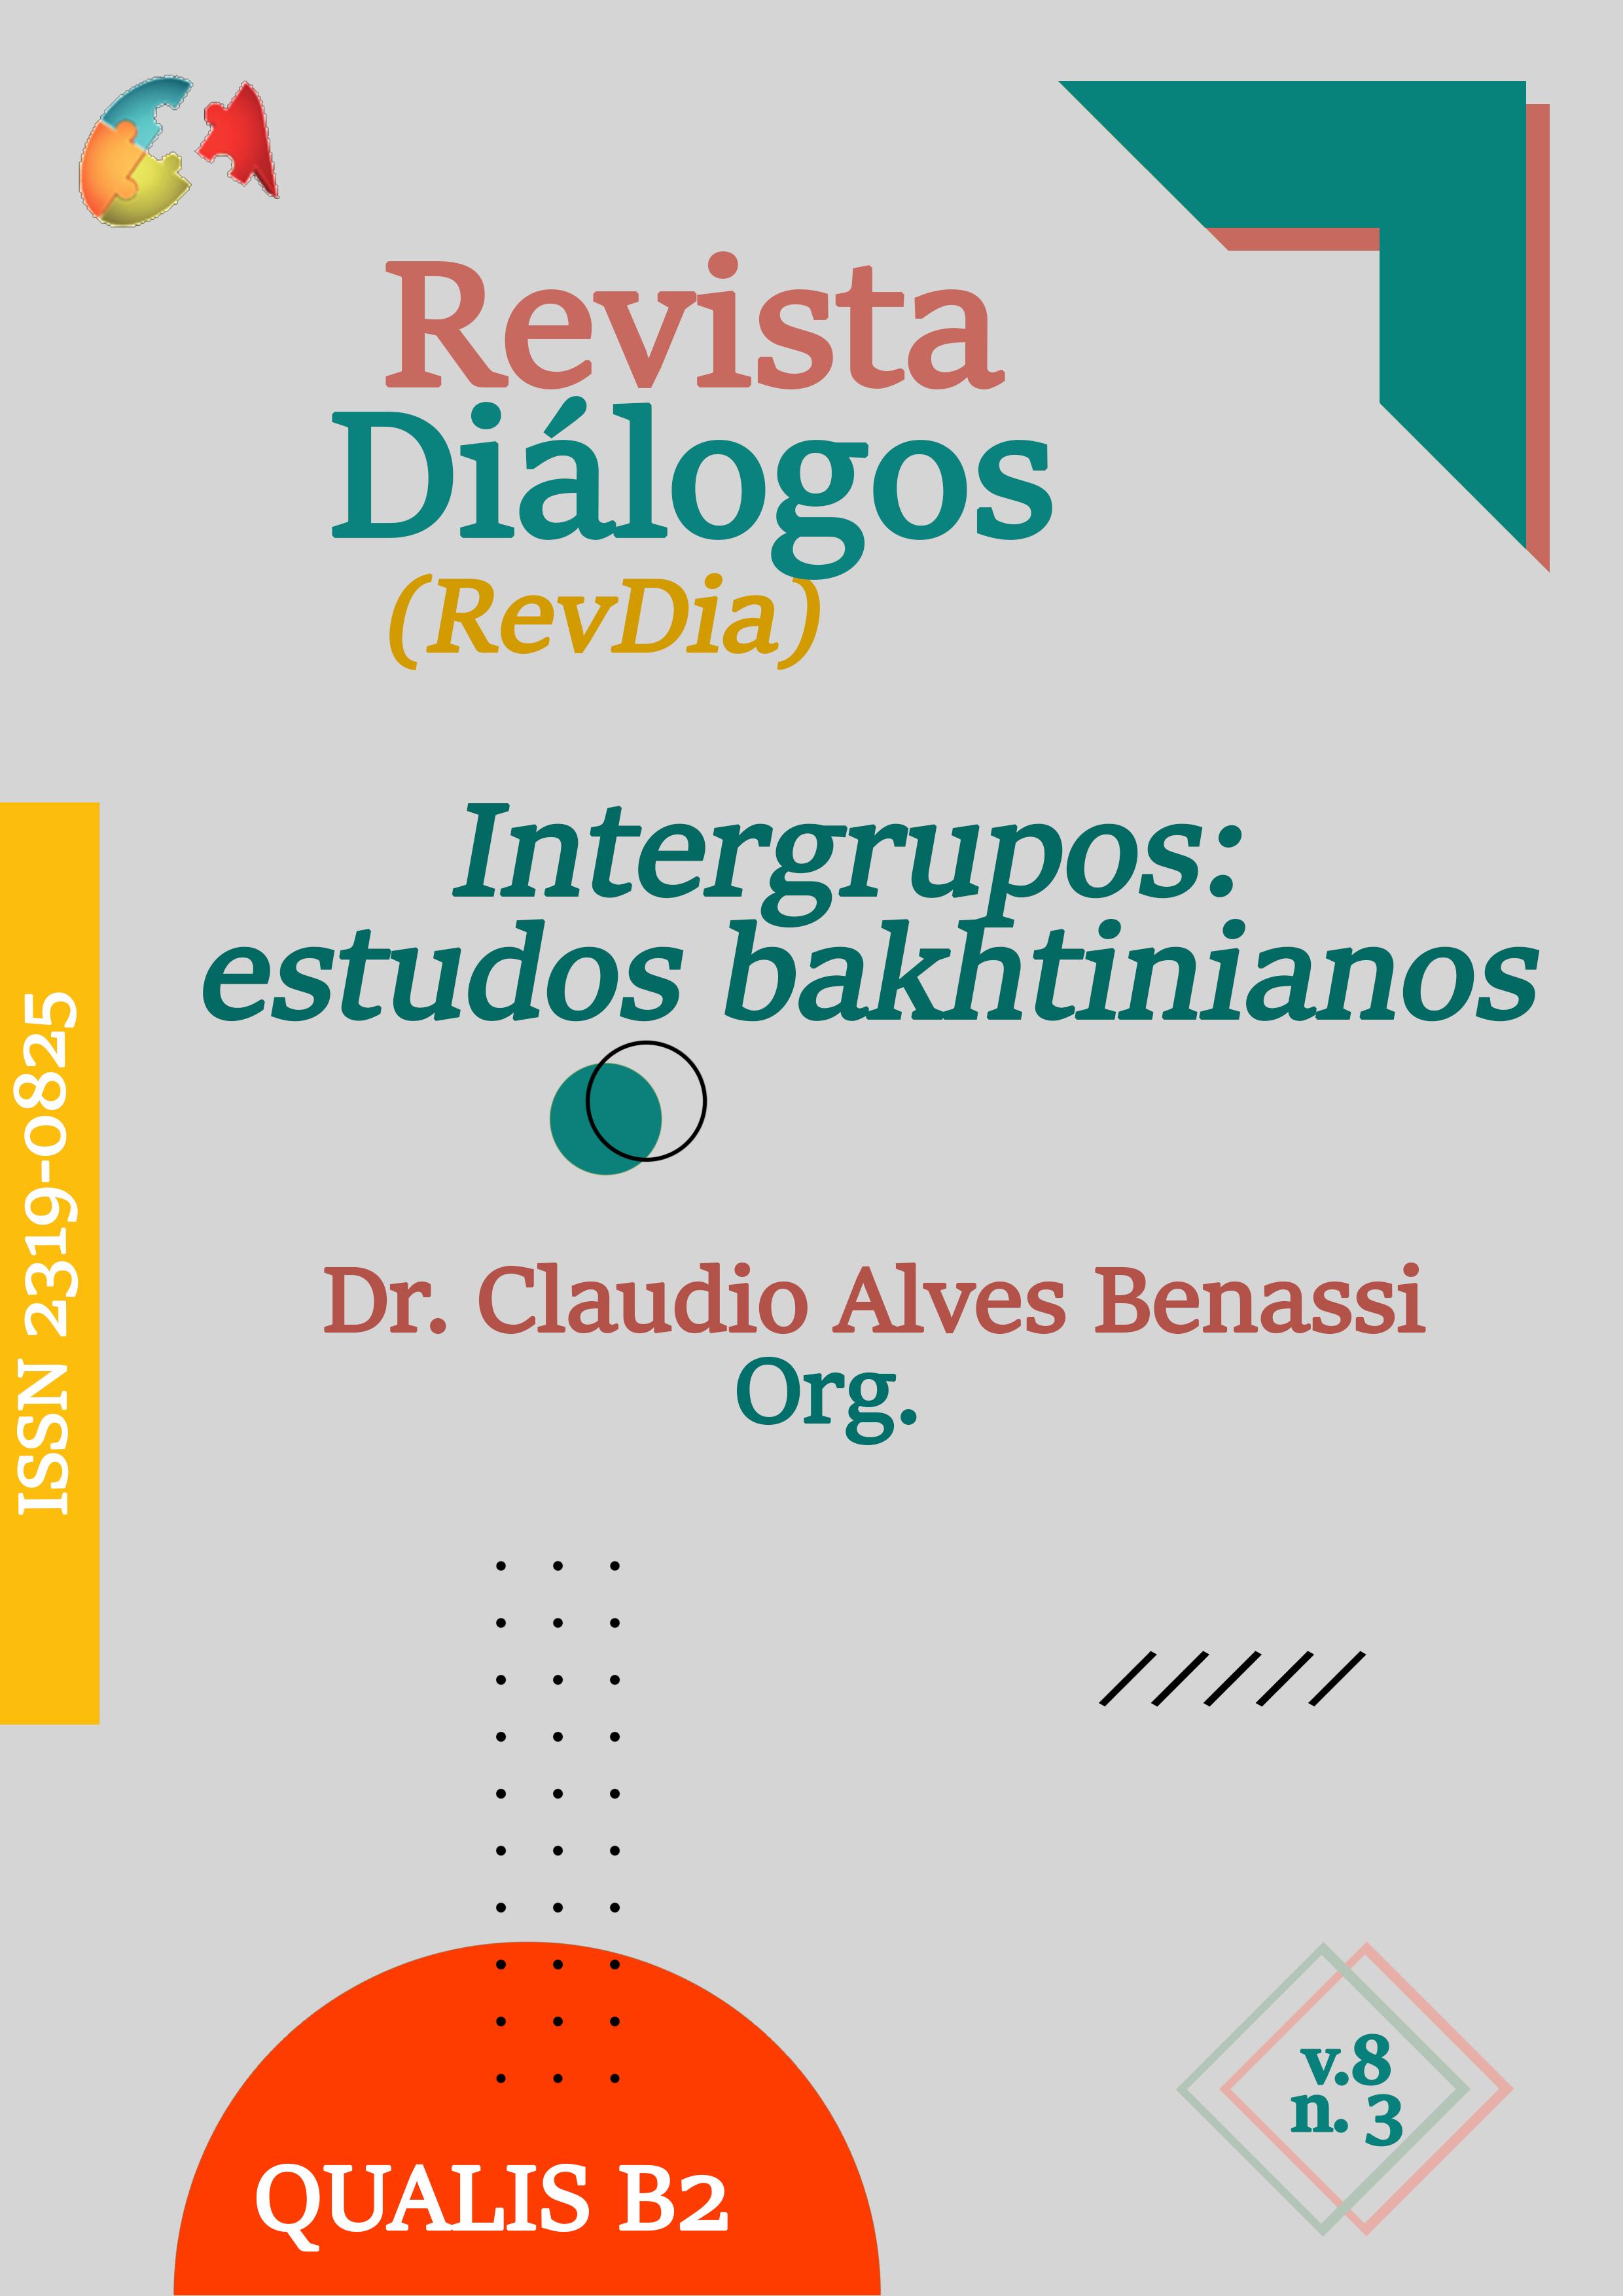 Visualizar v. 8 n. 3 (2020): Intergrupos: estudos bakhtinianos